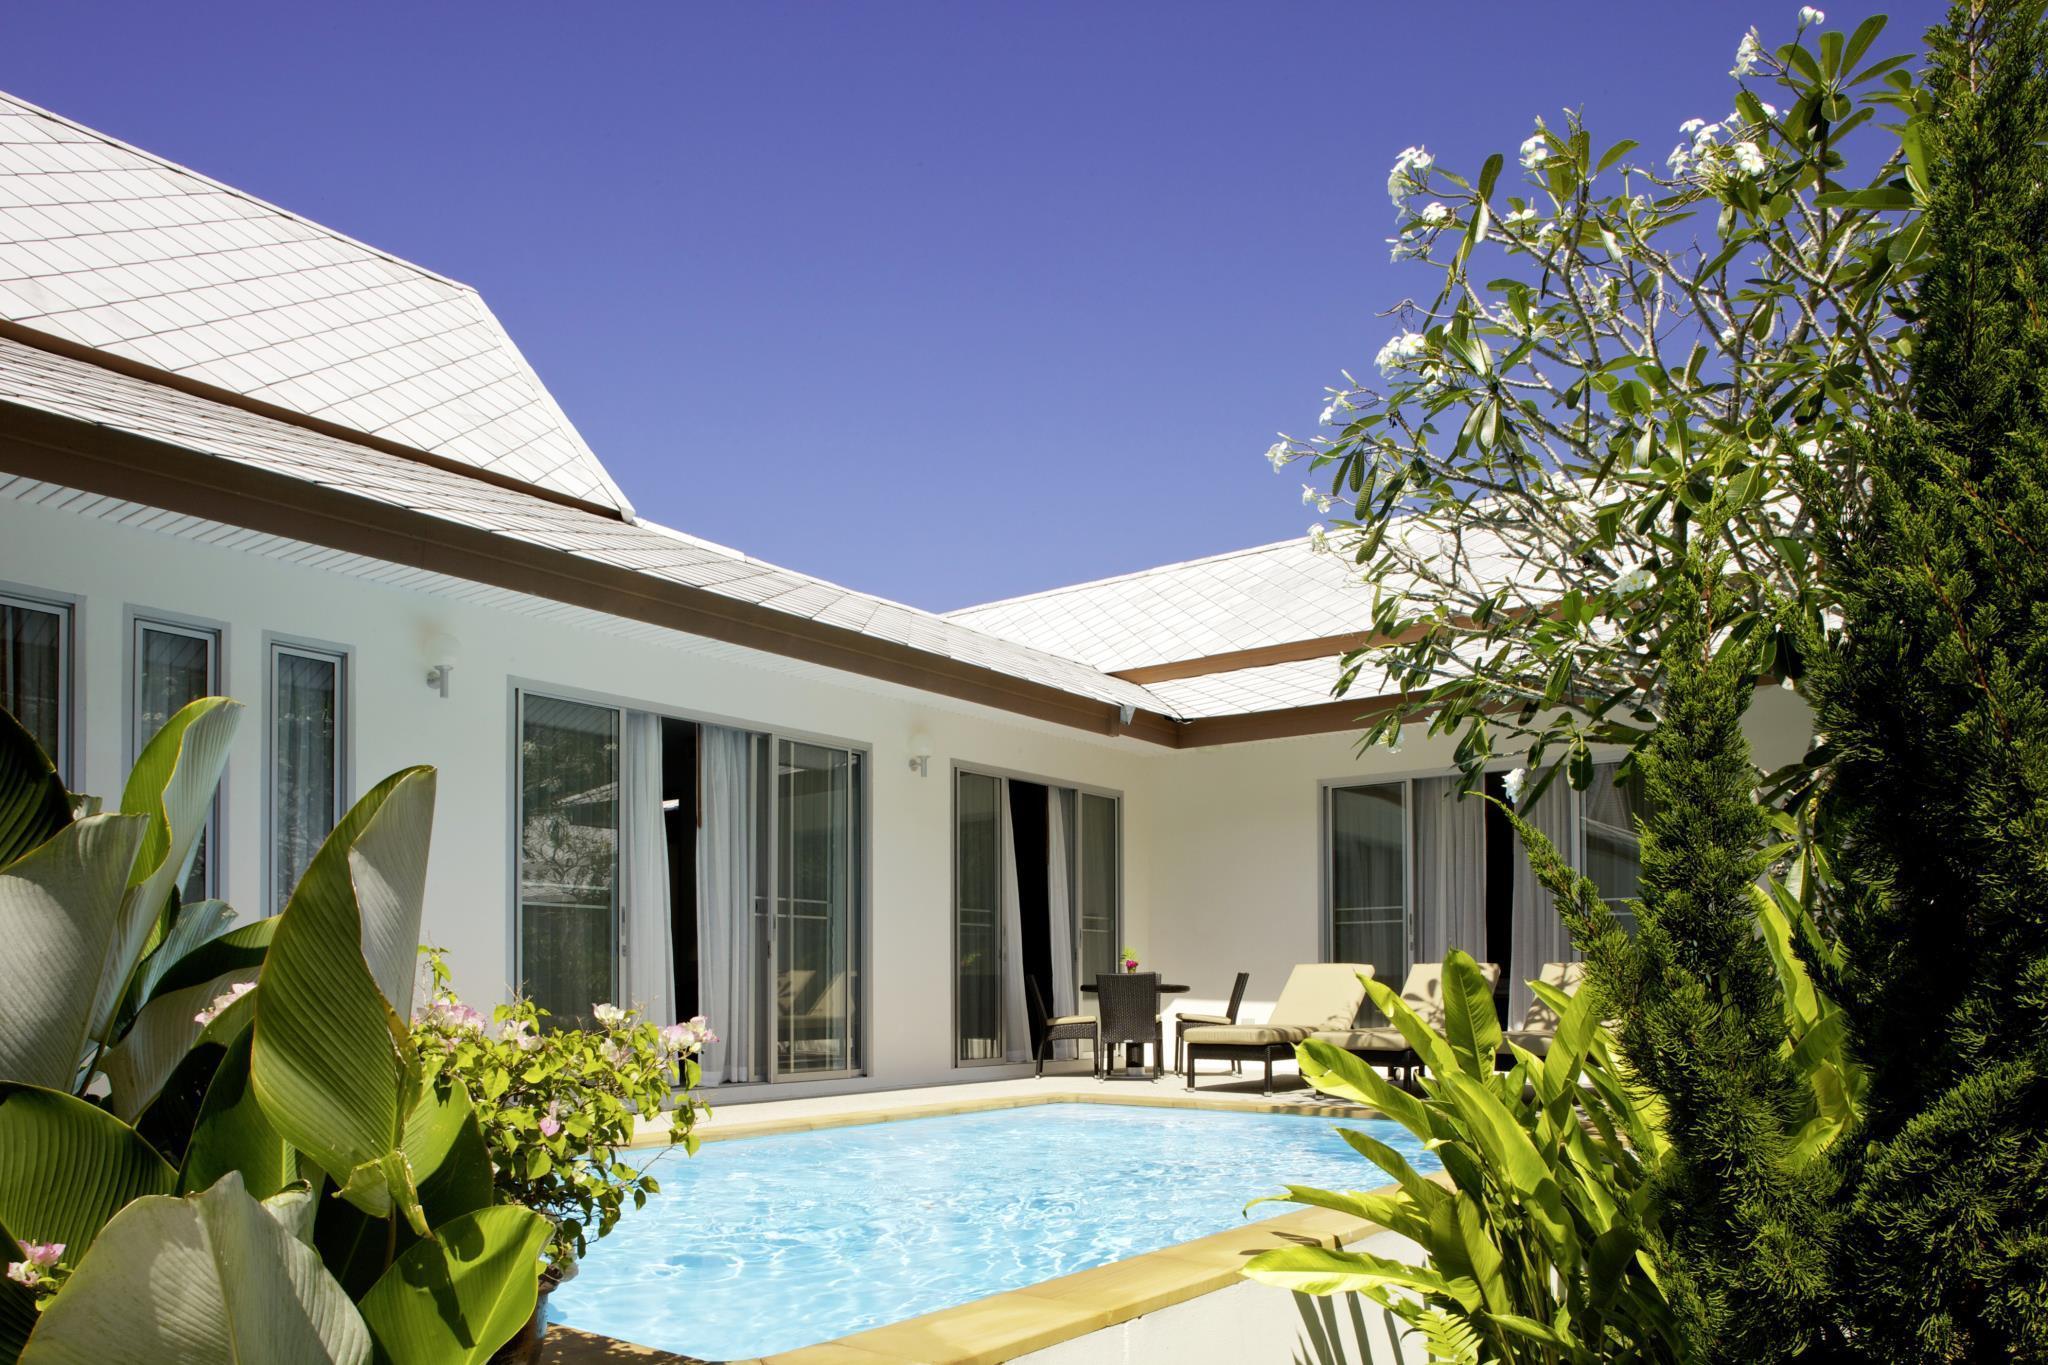 Baan Gecko Private Pool Villa บ้านเกคโค่ ไพรเวทพูล วิลลา